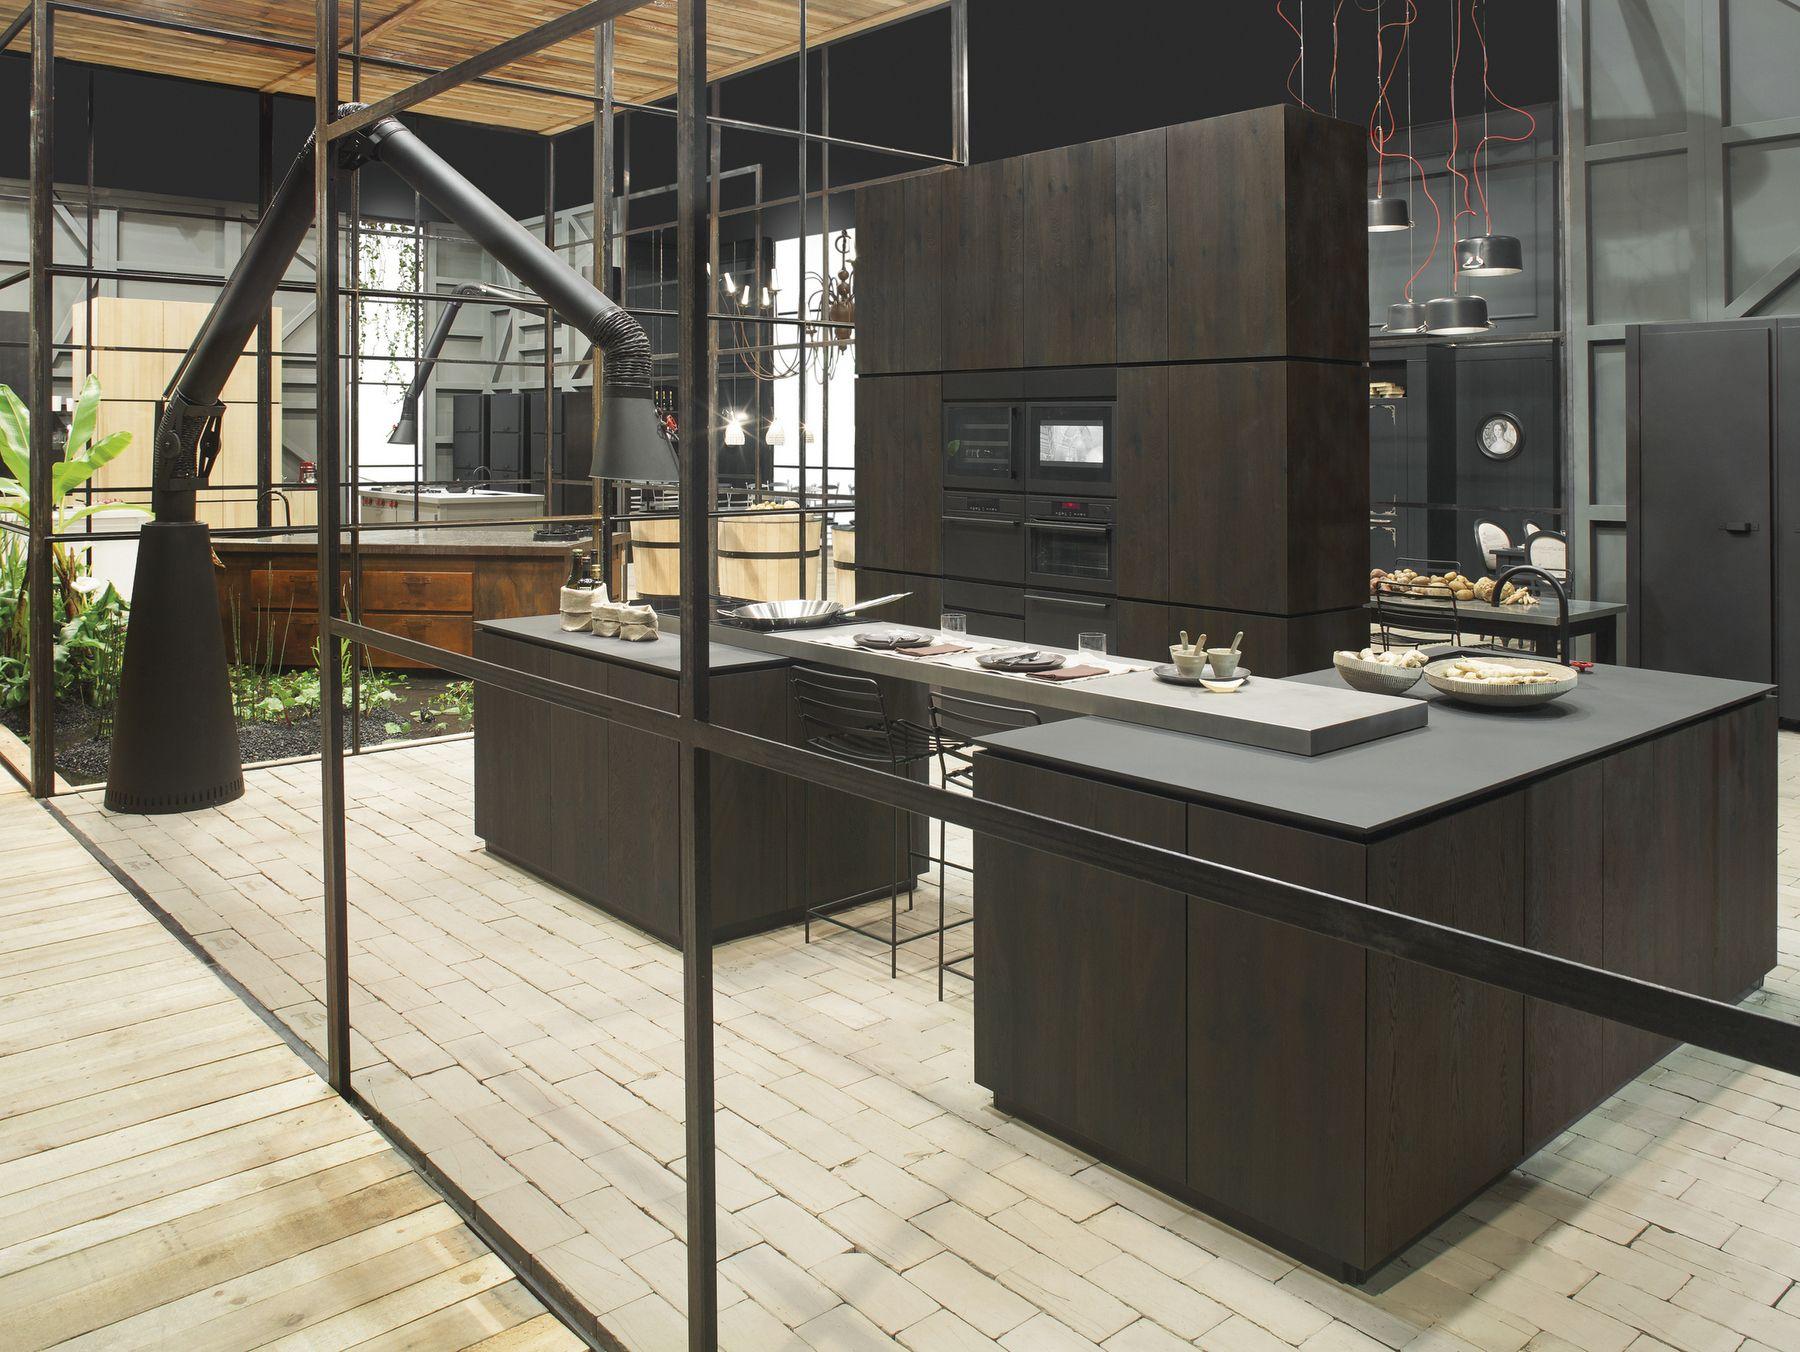 Wood Fibre Kitchen With Island NATURAL SKIN HOME Natural Skin Collection By  Minacciolo | Design Silvio